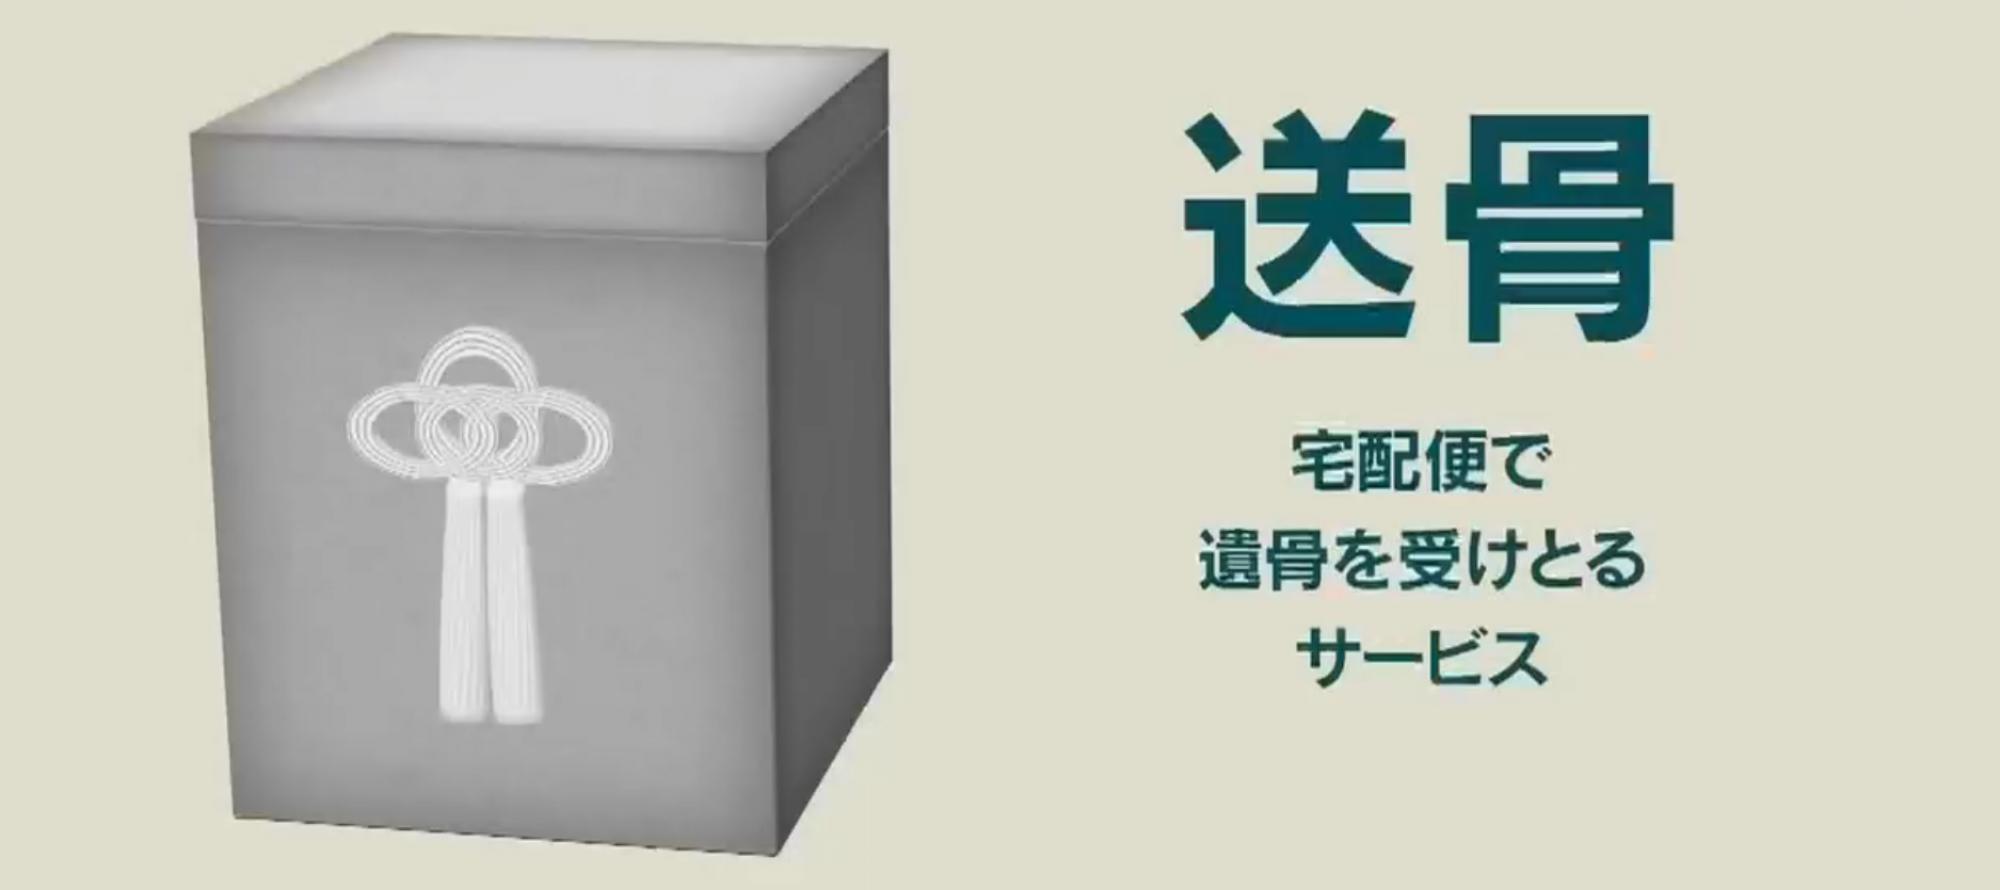 送骨.com